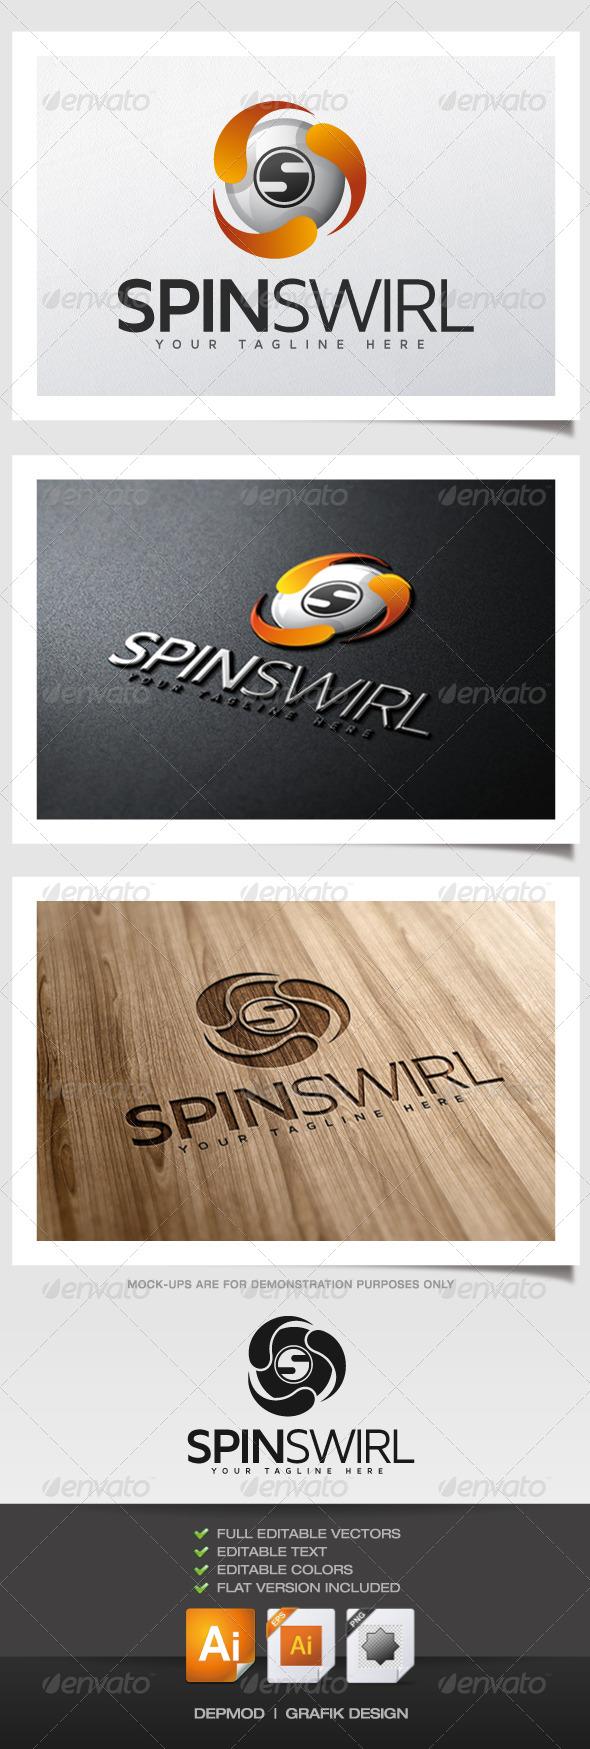 Spin Swirl Logo - Abstract Logo Templates